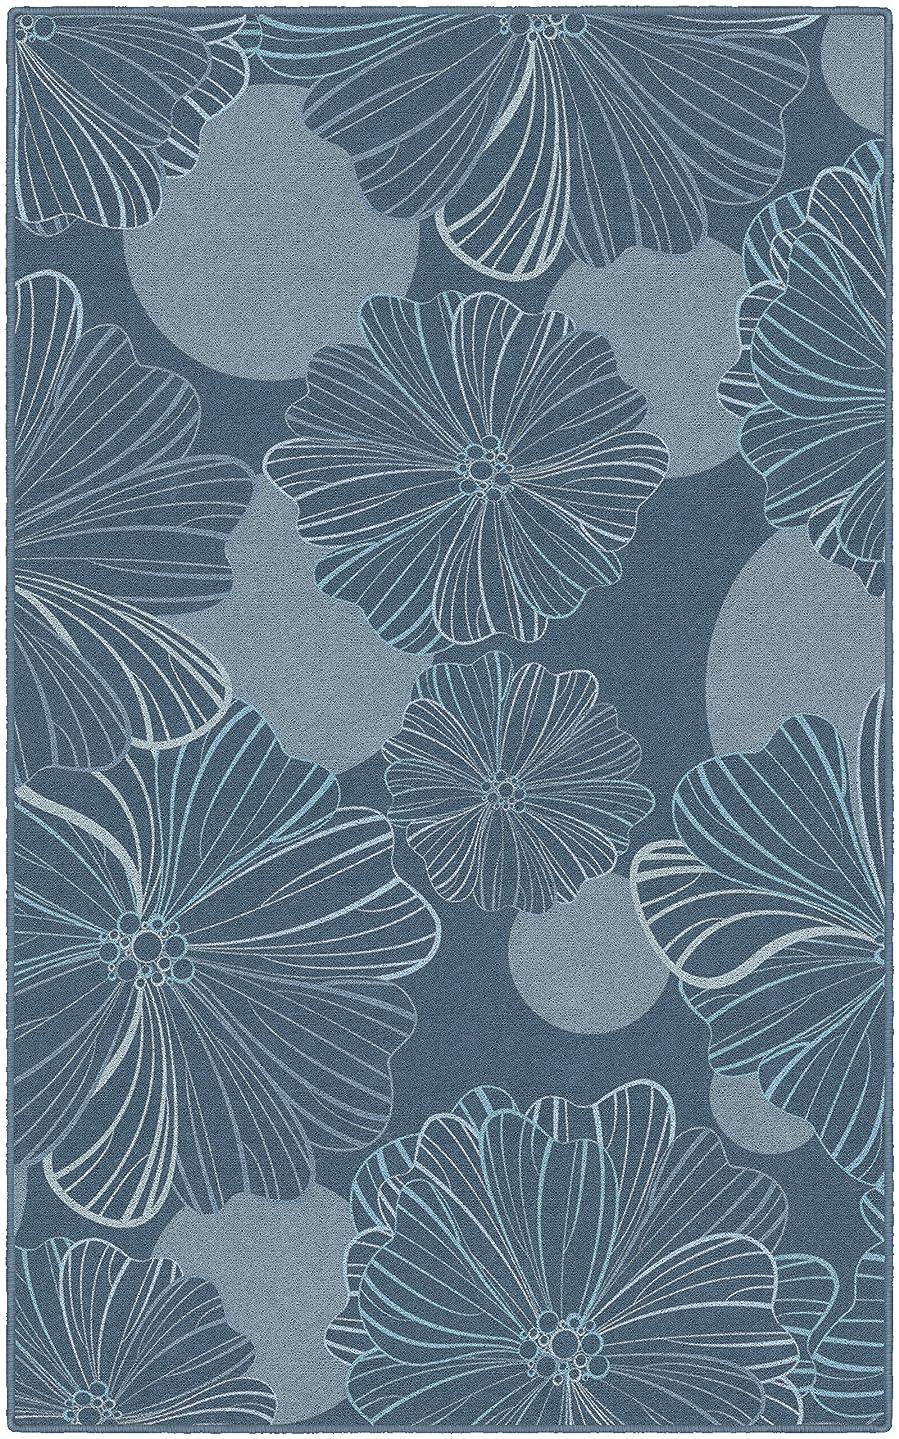 Brumlow Mills EW10295-40x60 Oversized Flowers in Gray Blue Floral Area Rug, 3'4